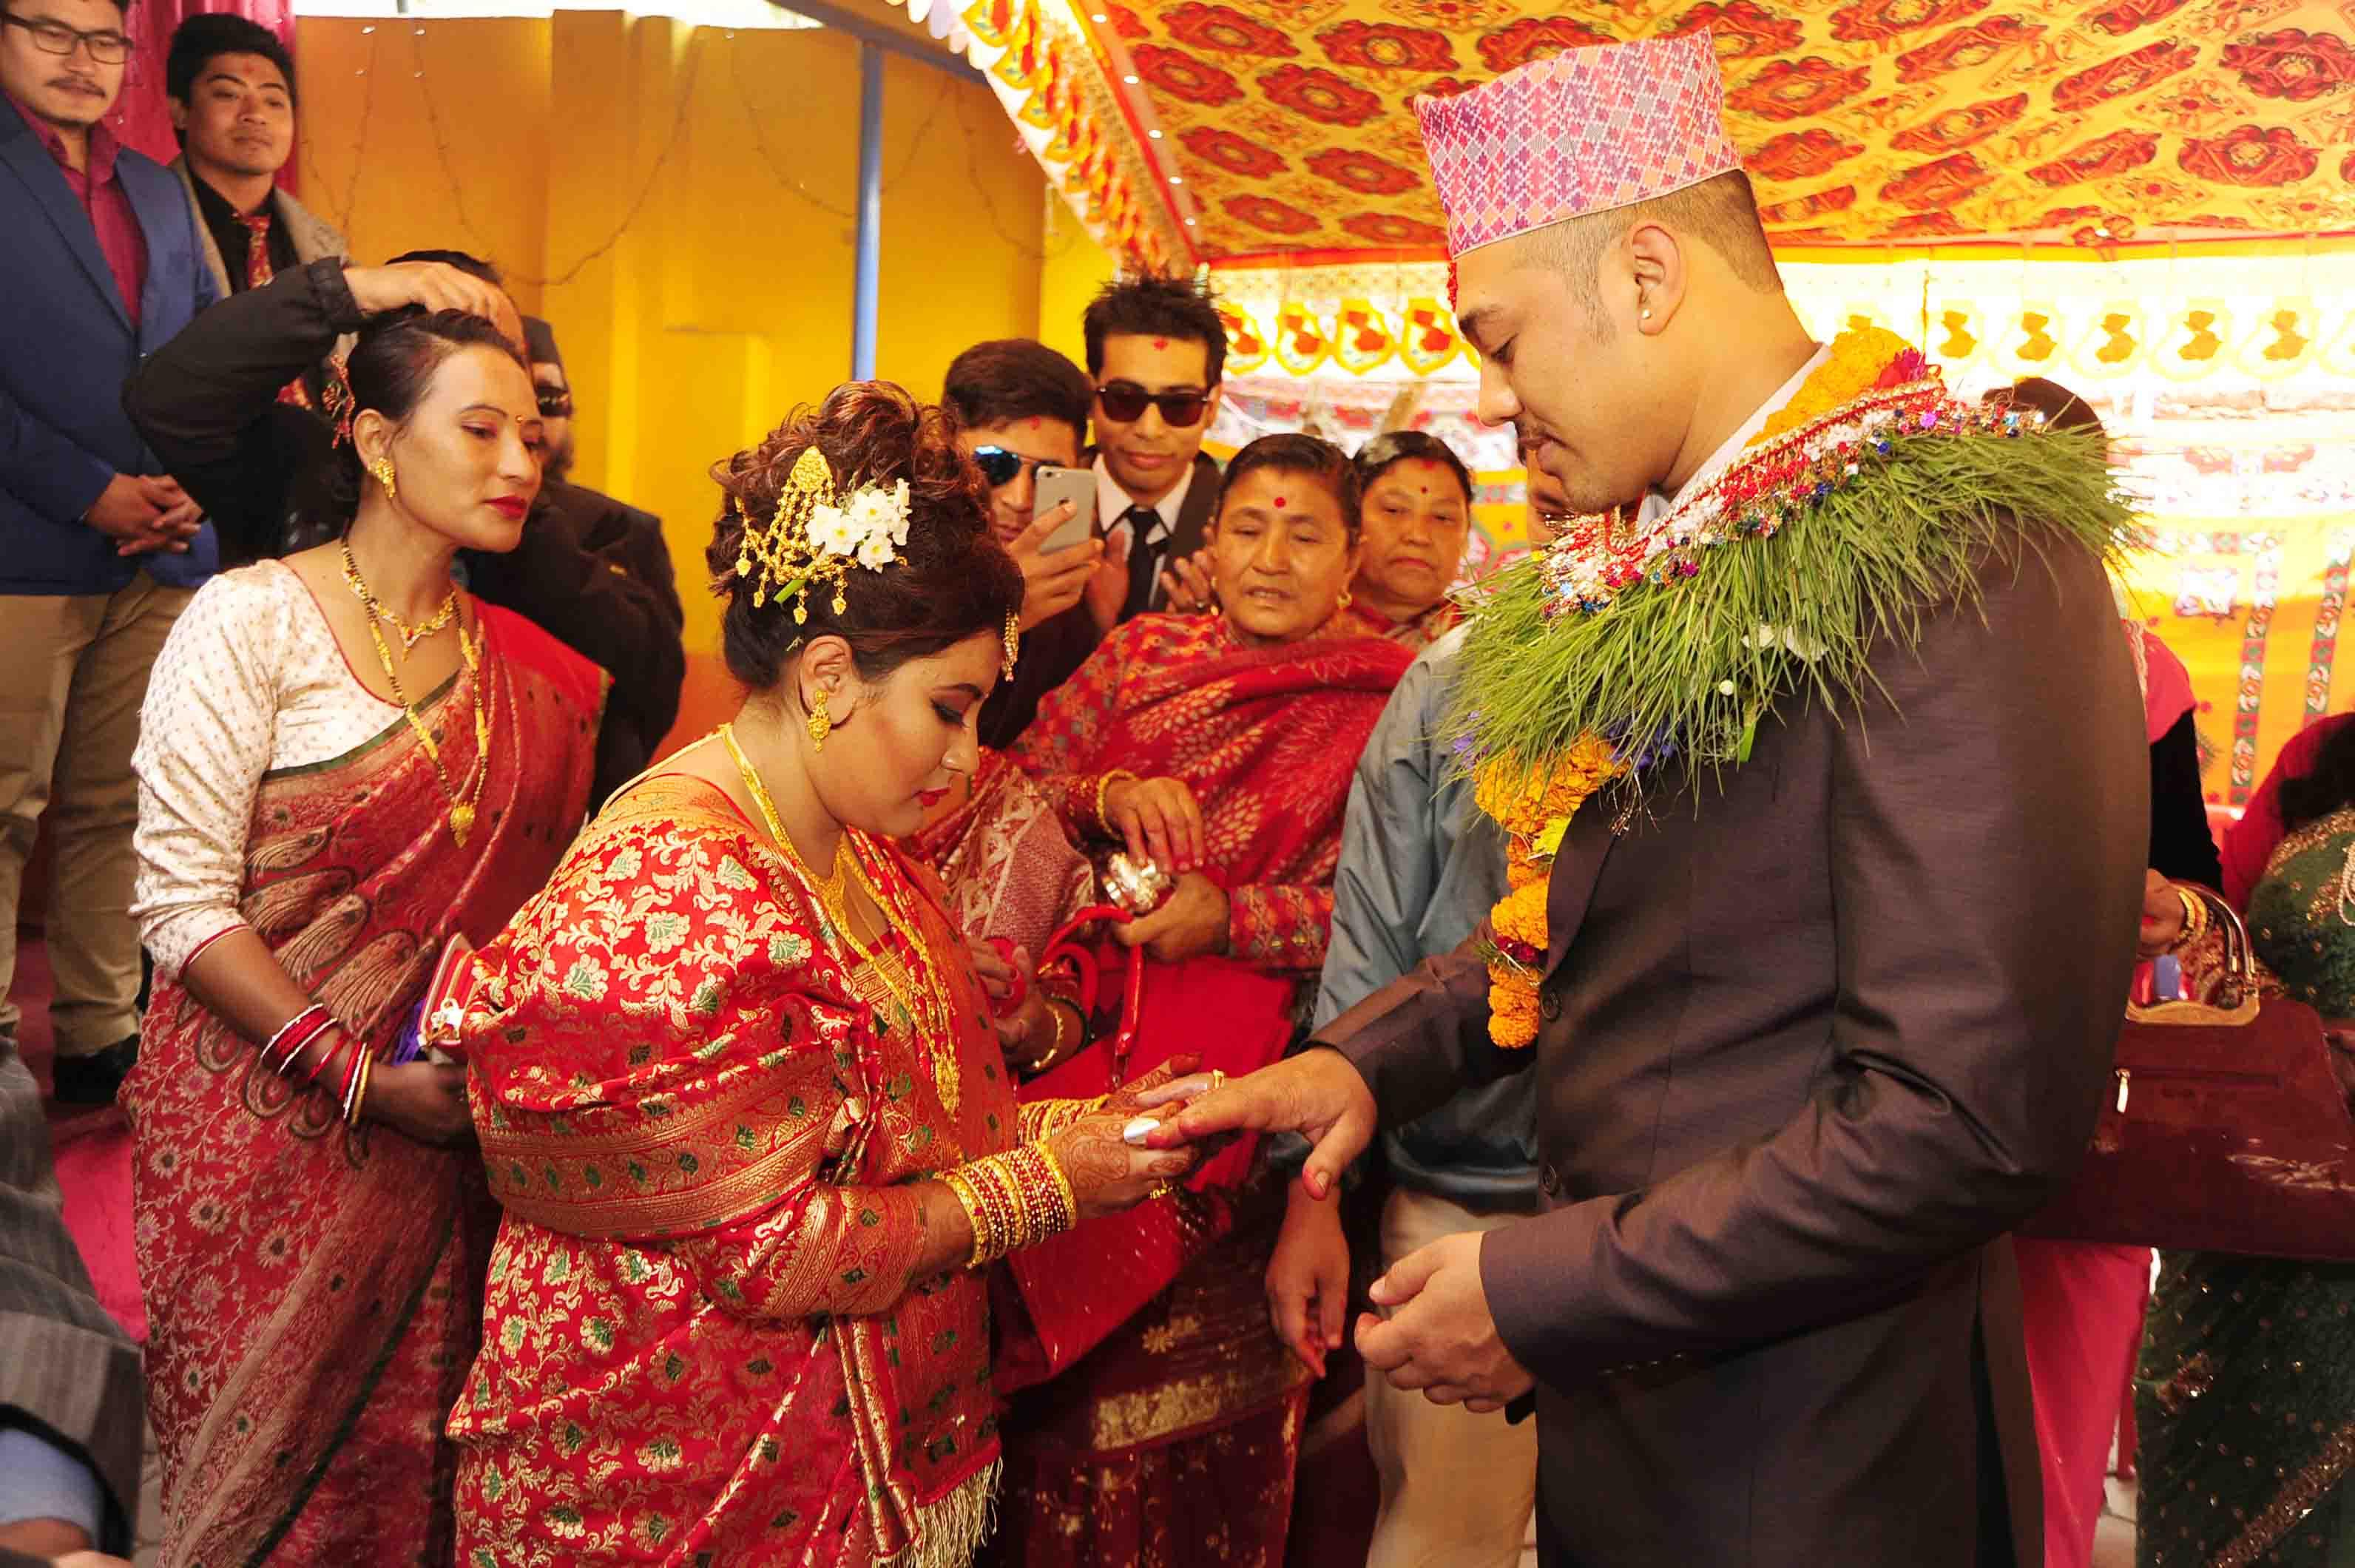 An Elaborate Ritual called Marriage